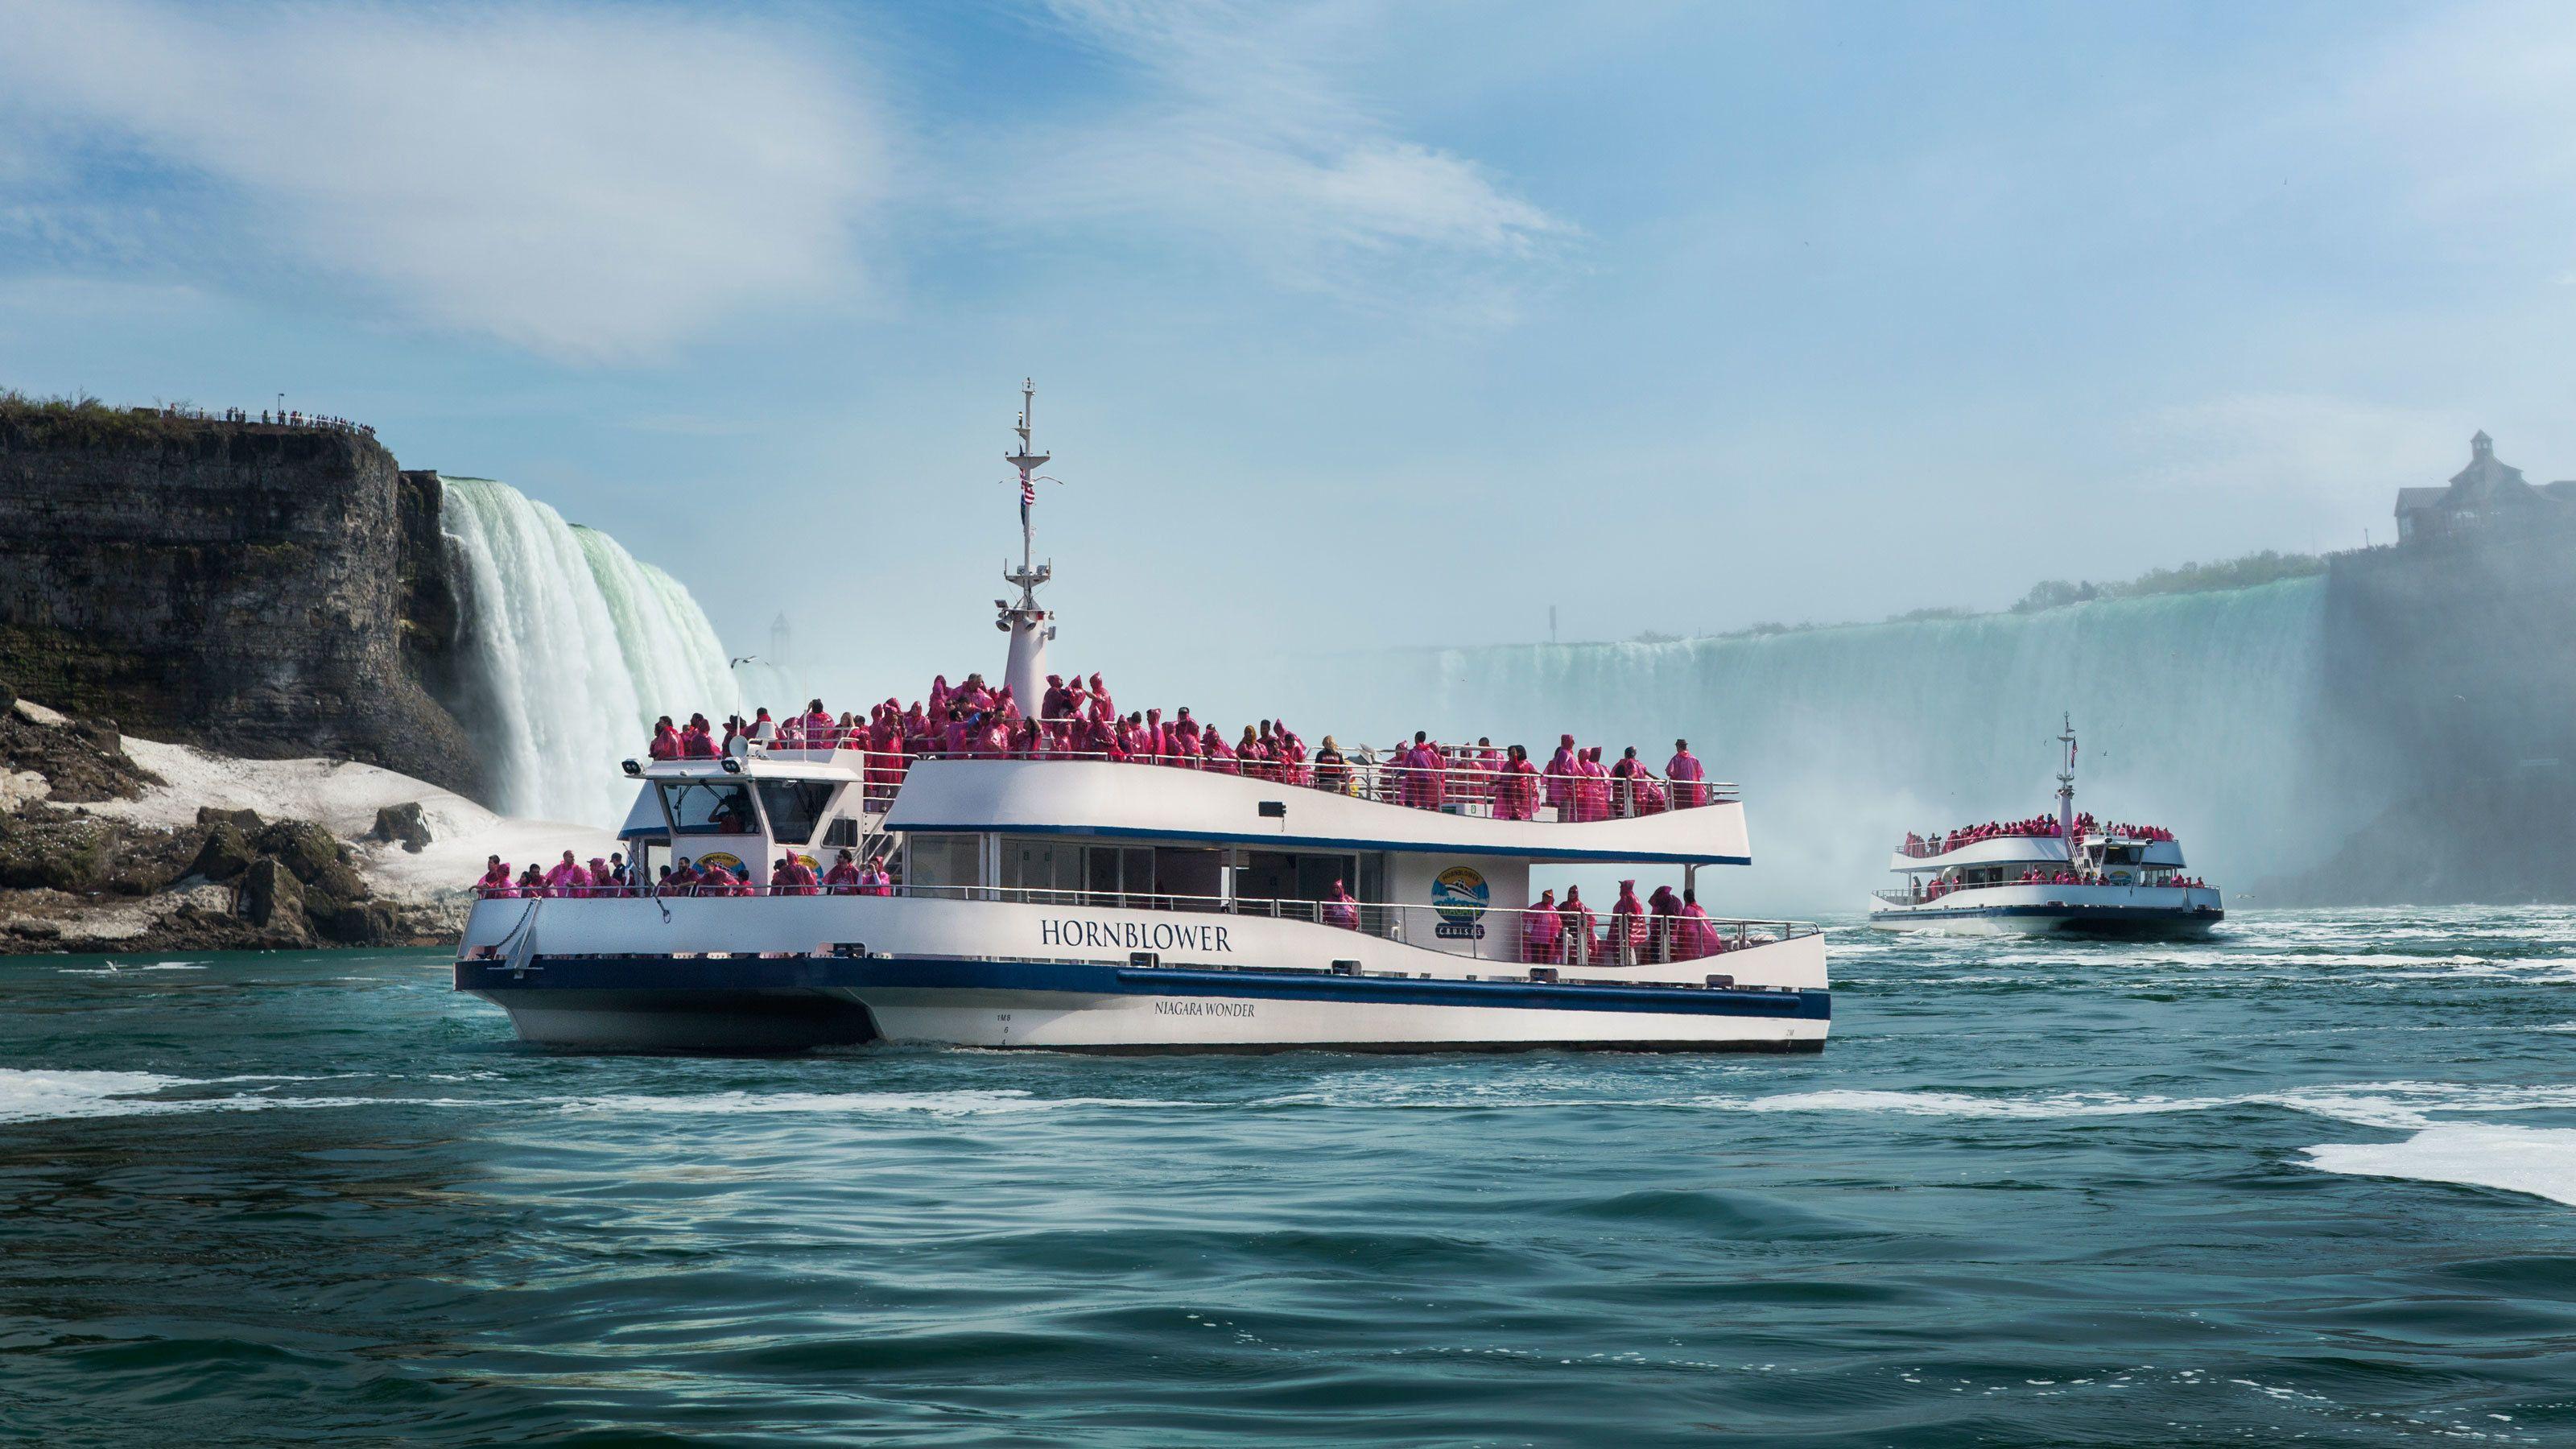 Boats voyaging through Niagara Falls